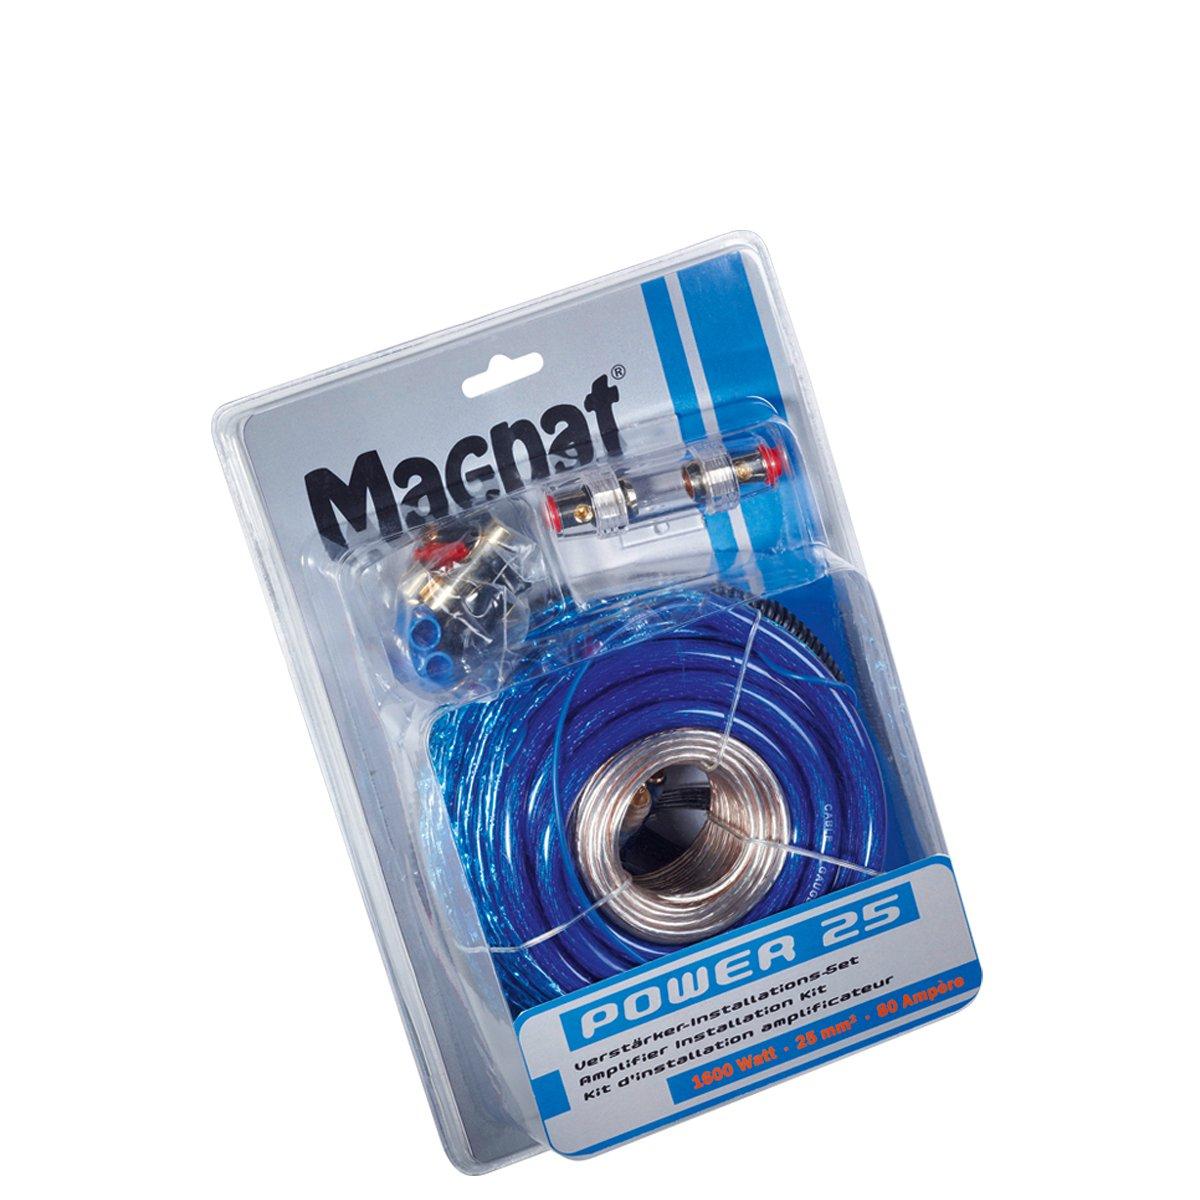 Magnat - Cavo Power 25, colore: Blu D165125